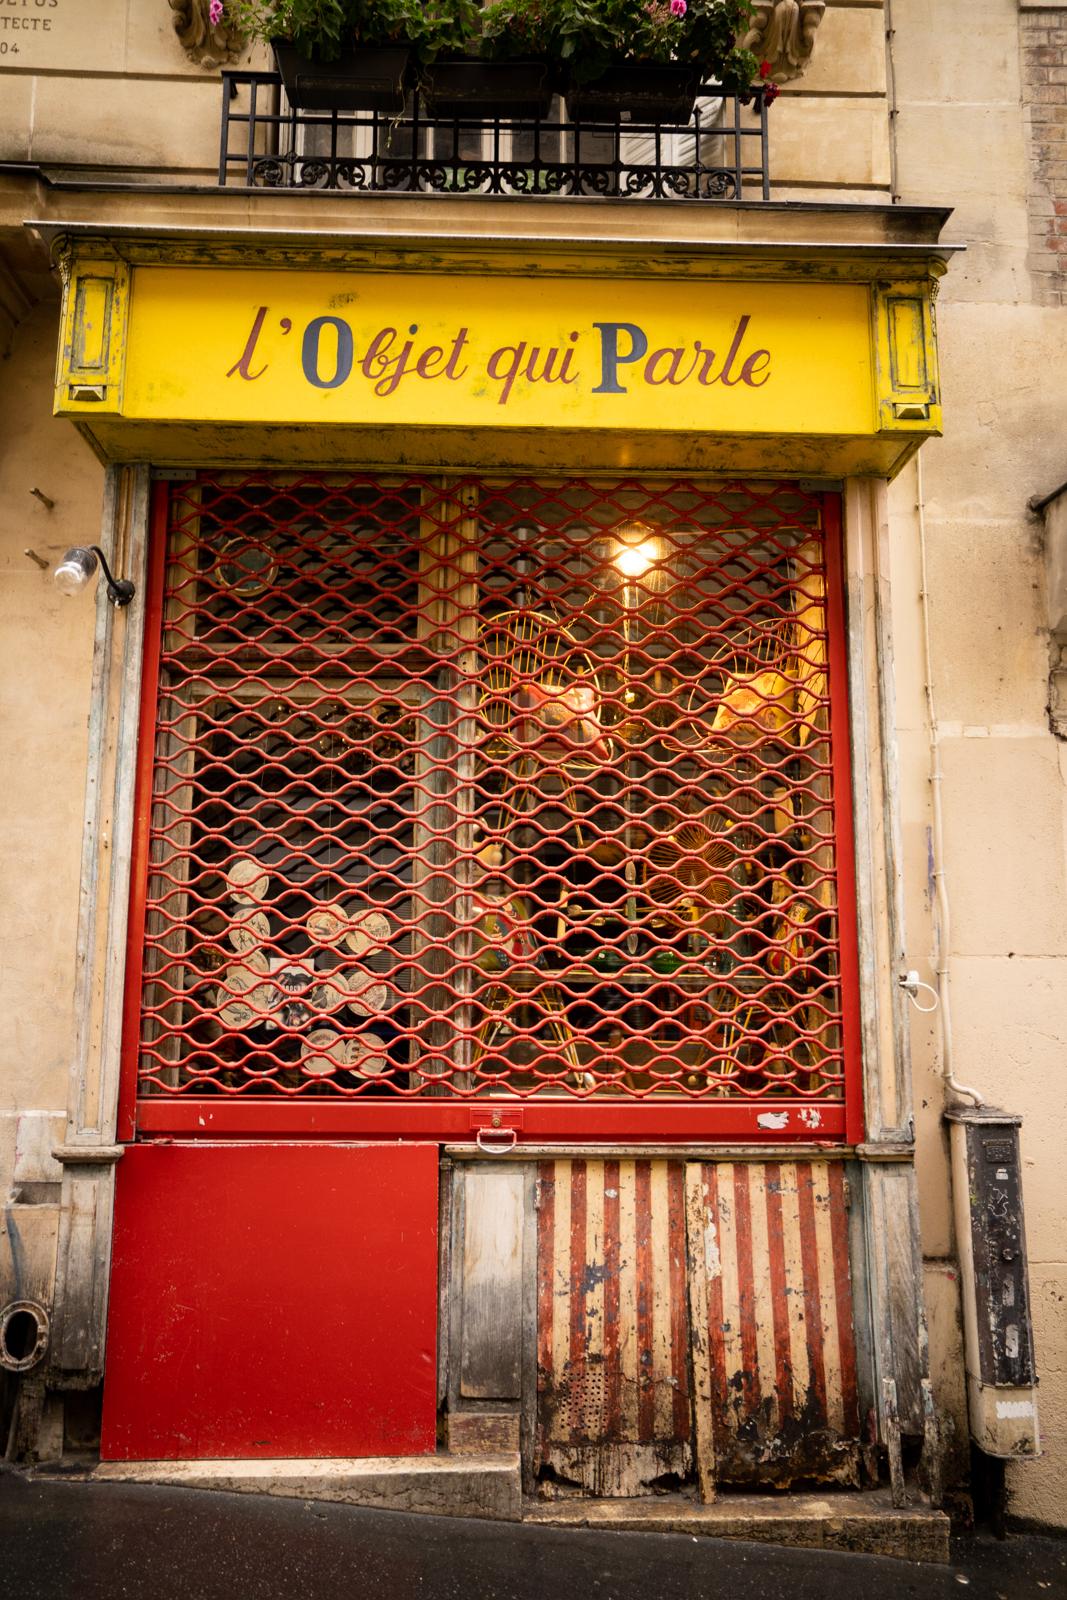 montmartre, montmartre pluie, montmartre automne, balade automne paris, balade paris 18, itinéraire balade paris, paris original, paris authnetique